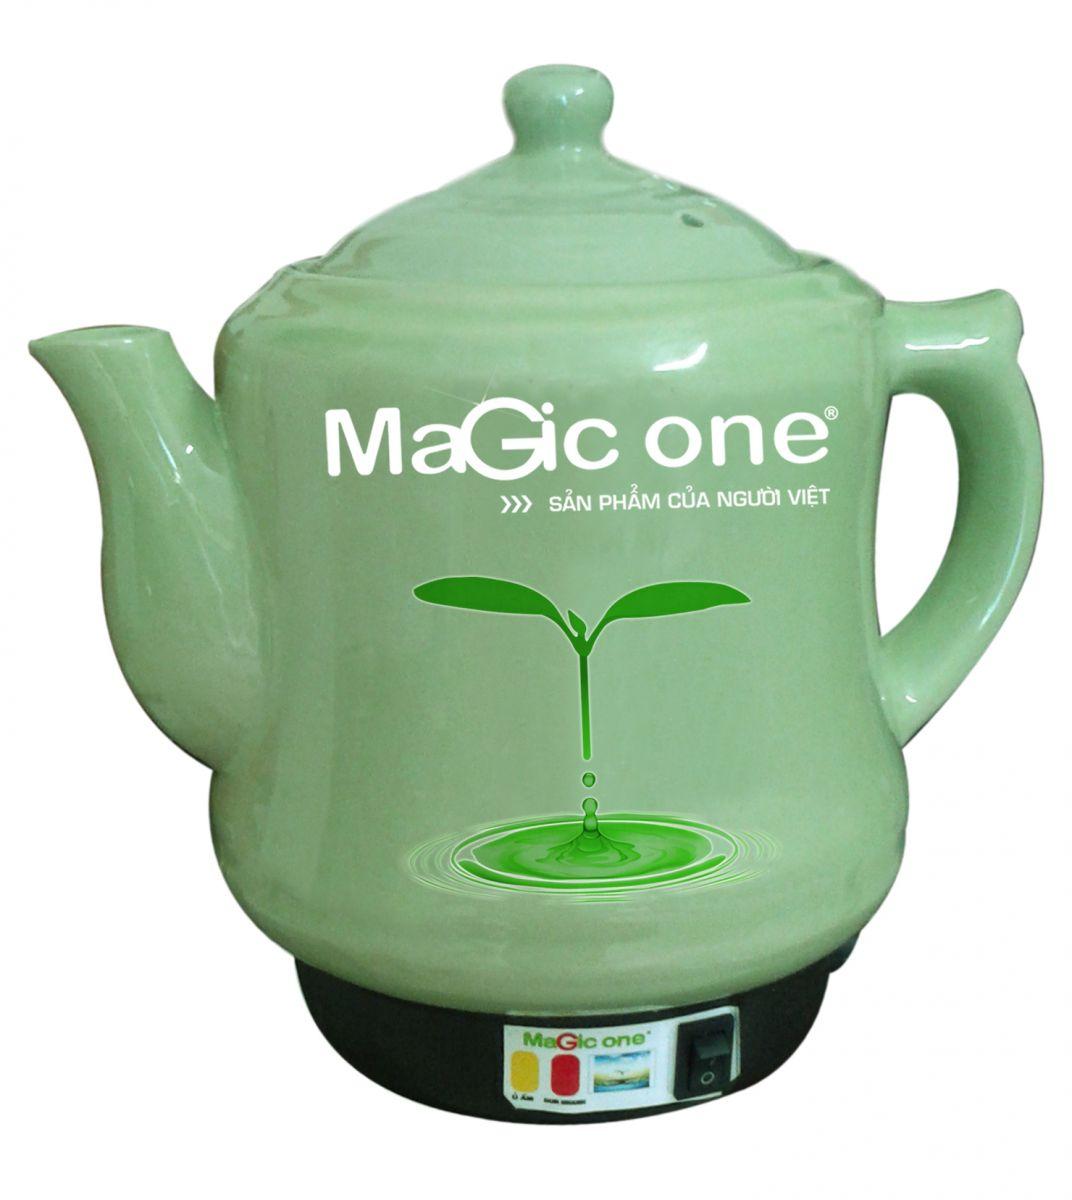 Ấm sắc thuốc Magic One MG55